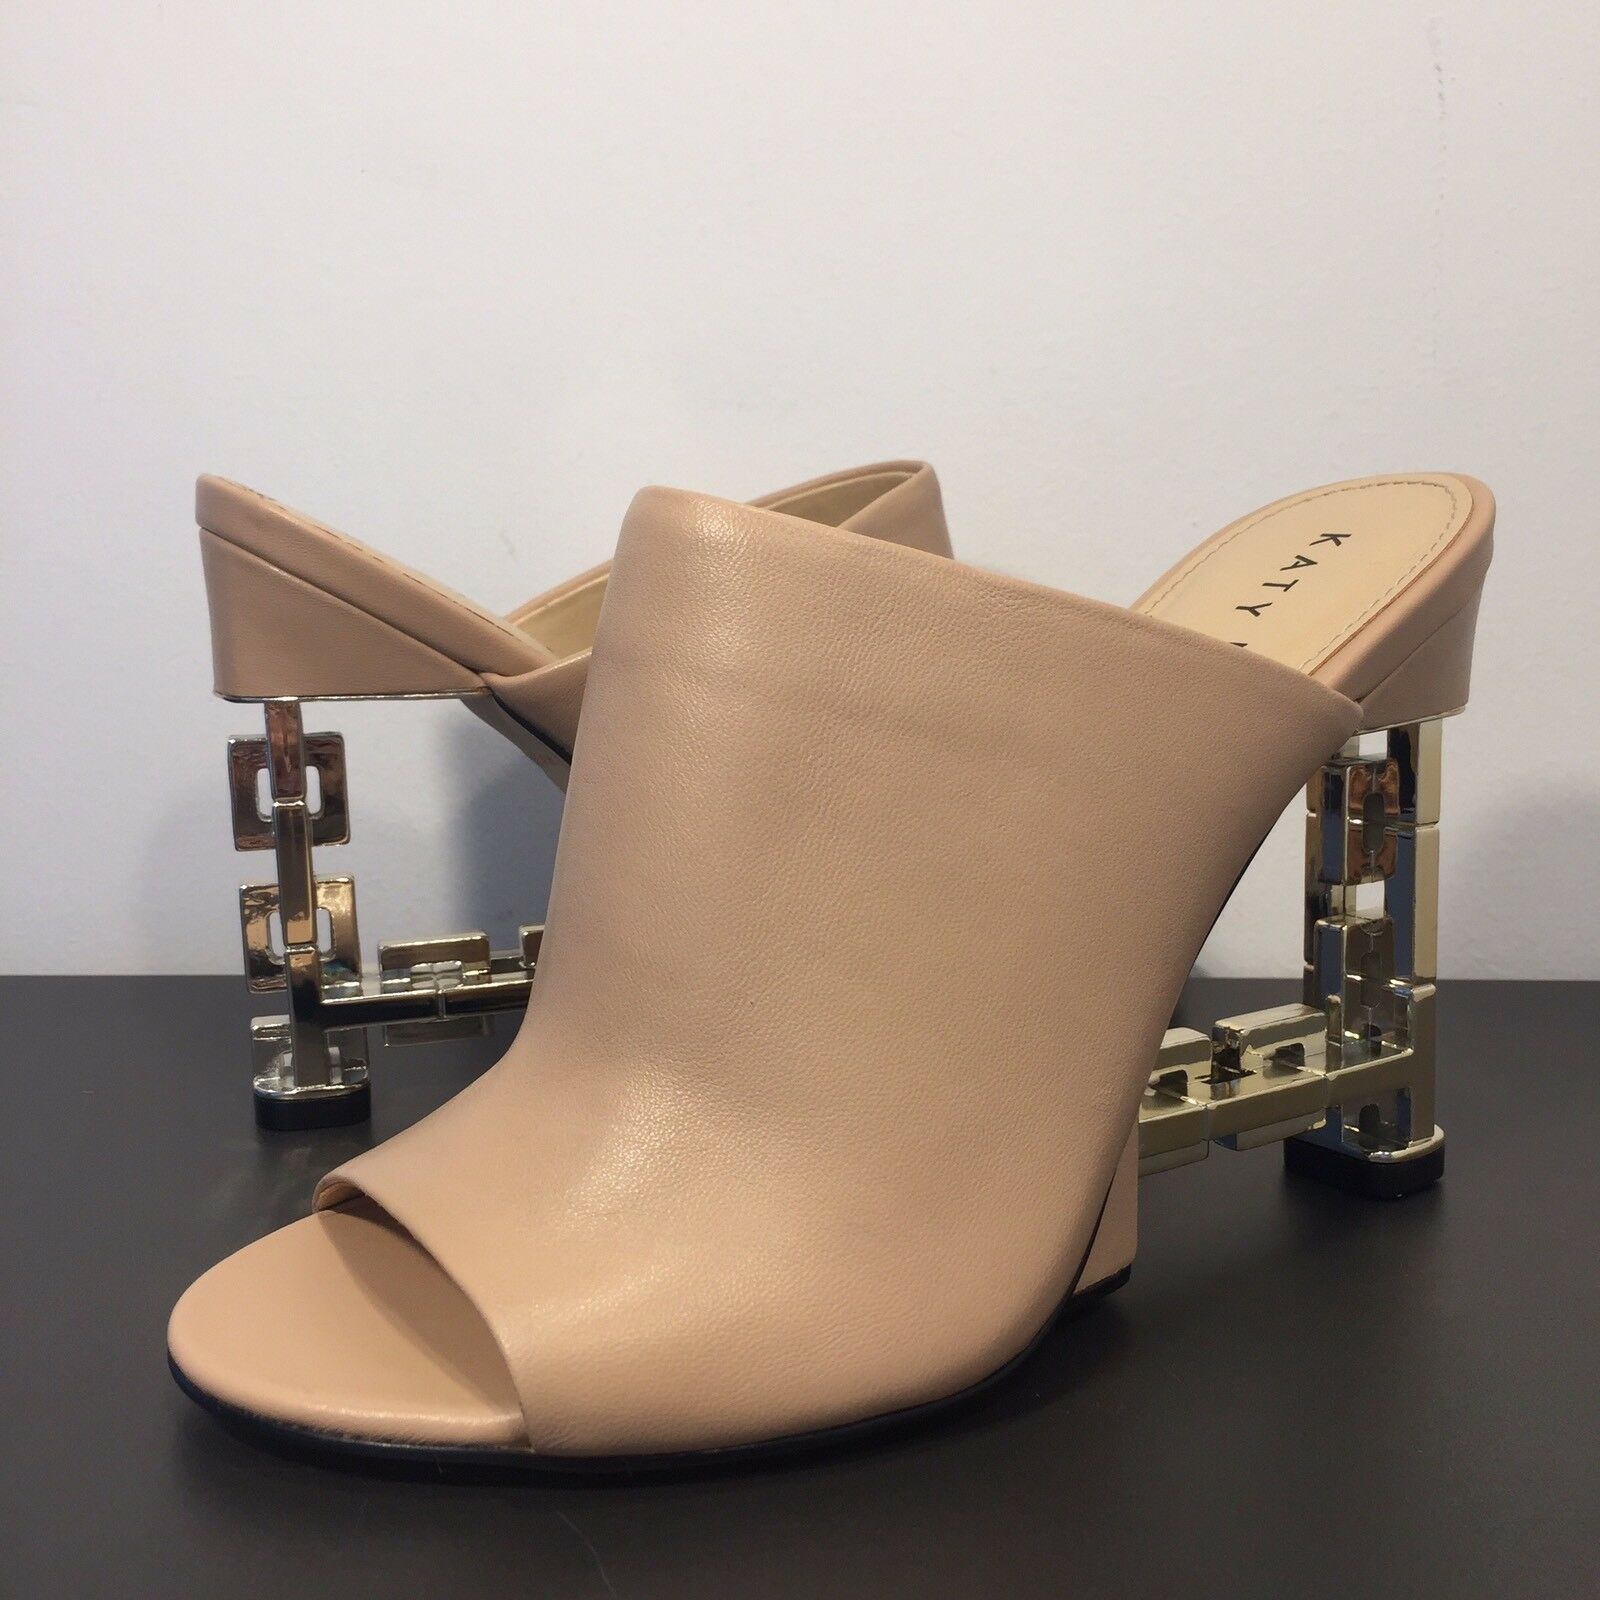 KATY PERRY 'The Perry' Nude Tan Leather or Mule Peep Toe Heel (MSRP  149)